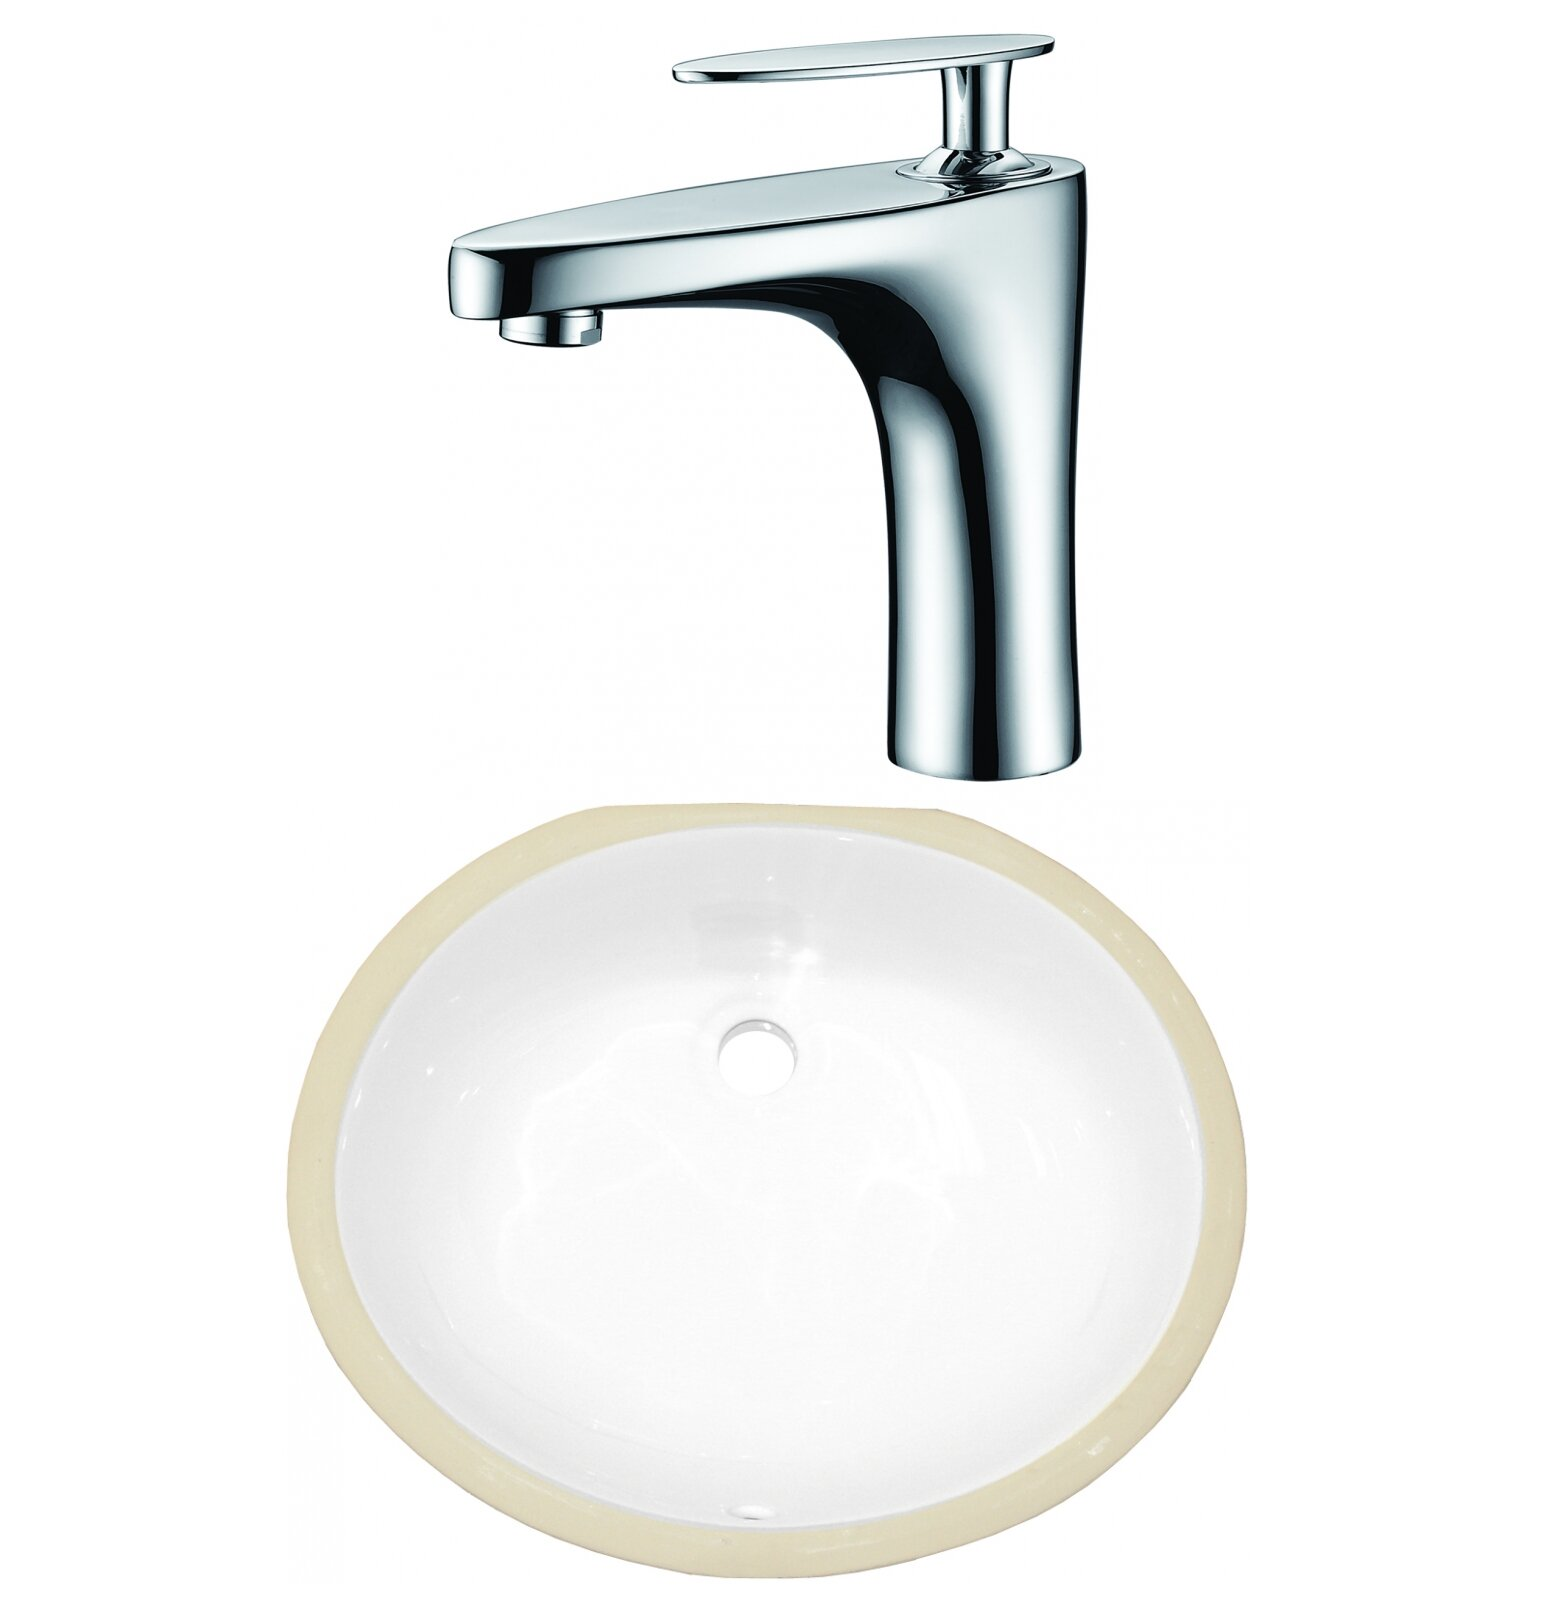 Bathroom Sinks - Undermount, Pedestal & More: Oval ...